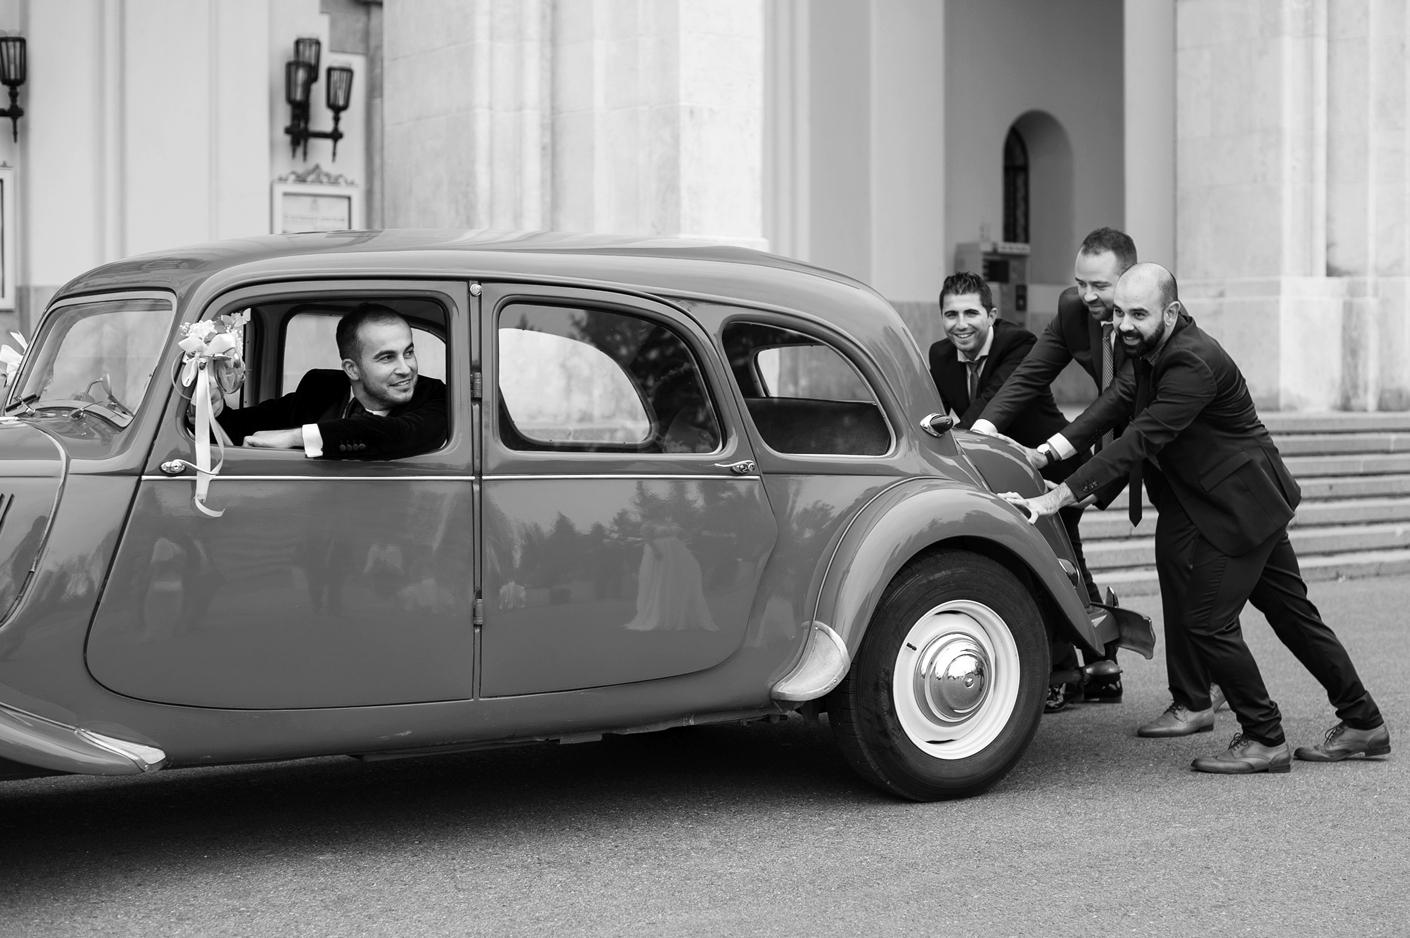 Fotograf profesionist de nunta, nunta, fotograf profesionist, fotograf Bucuresti, fotograf de nunta, sedinta foto retro, masina retro, masina de epoca nunta, cavaleri de onoare